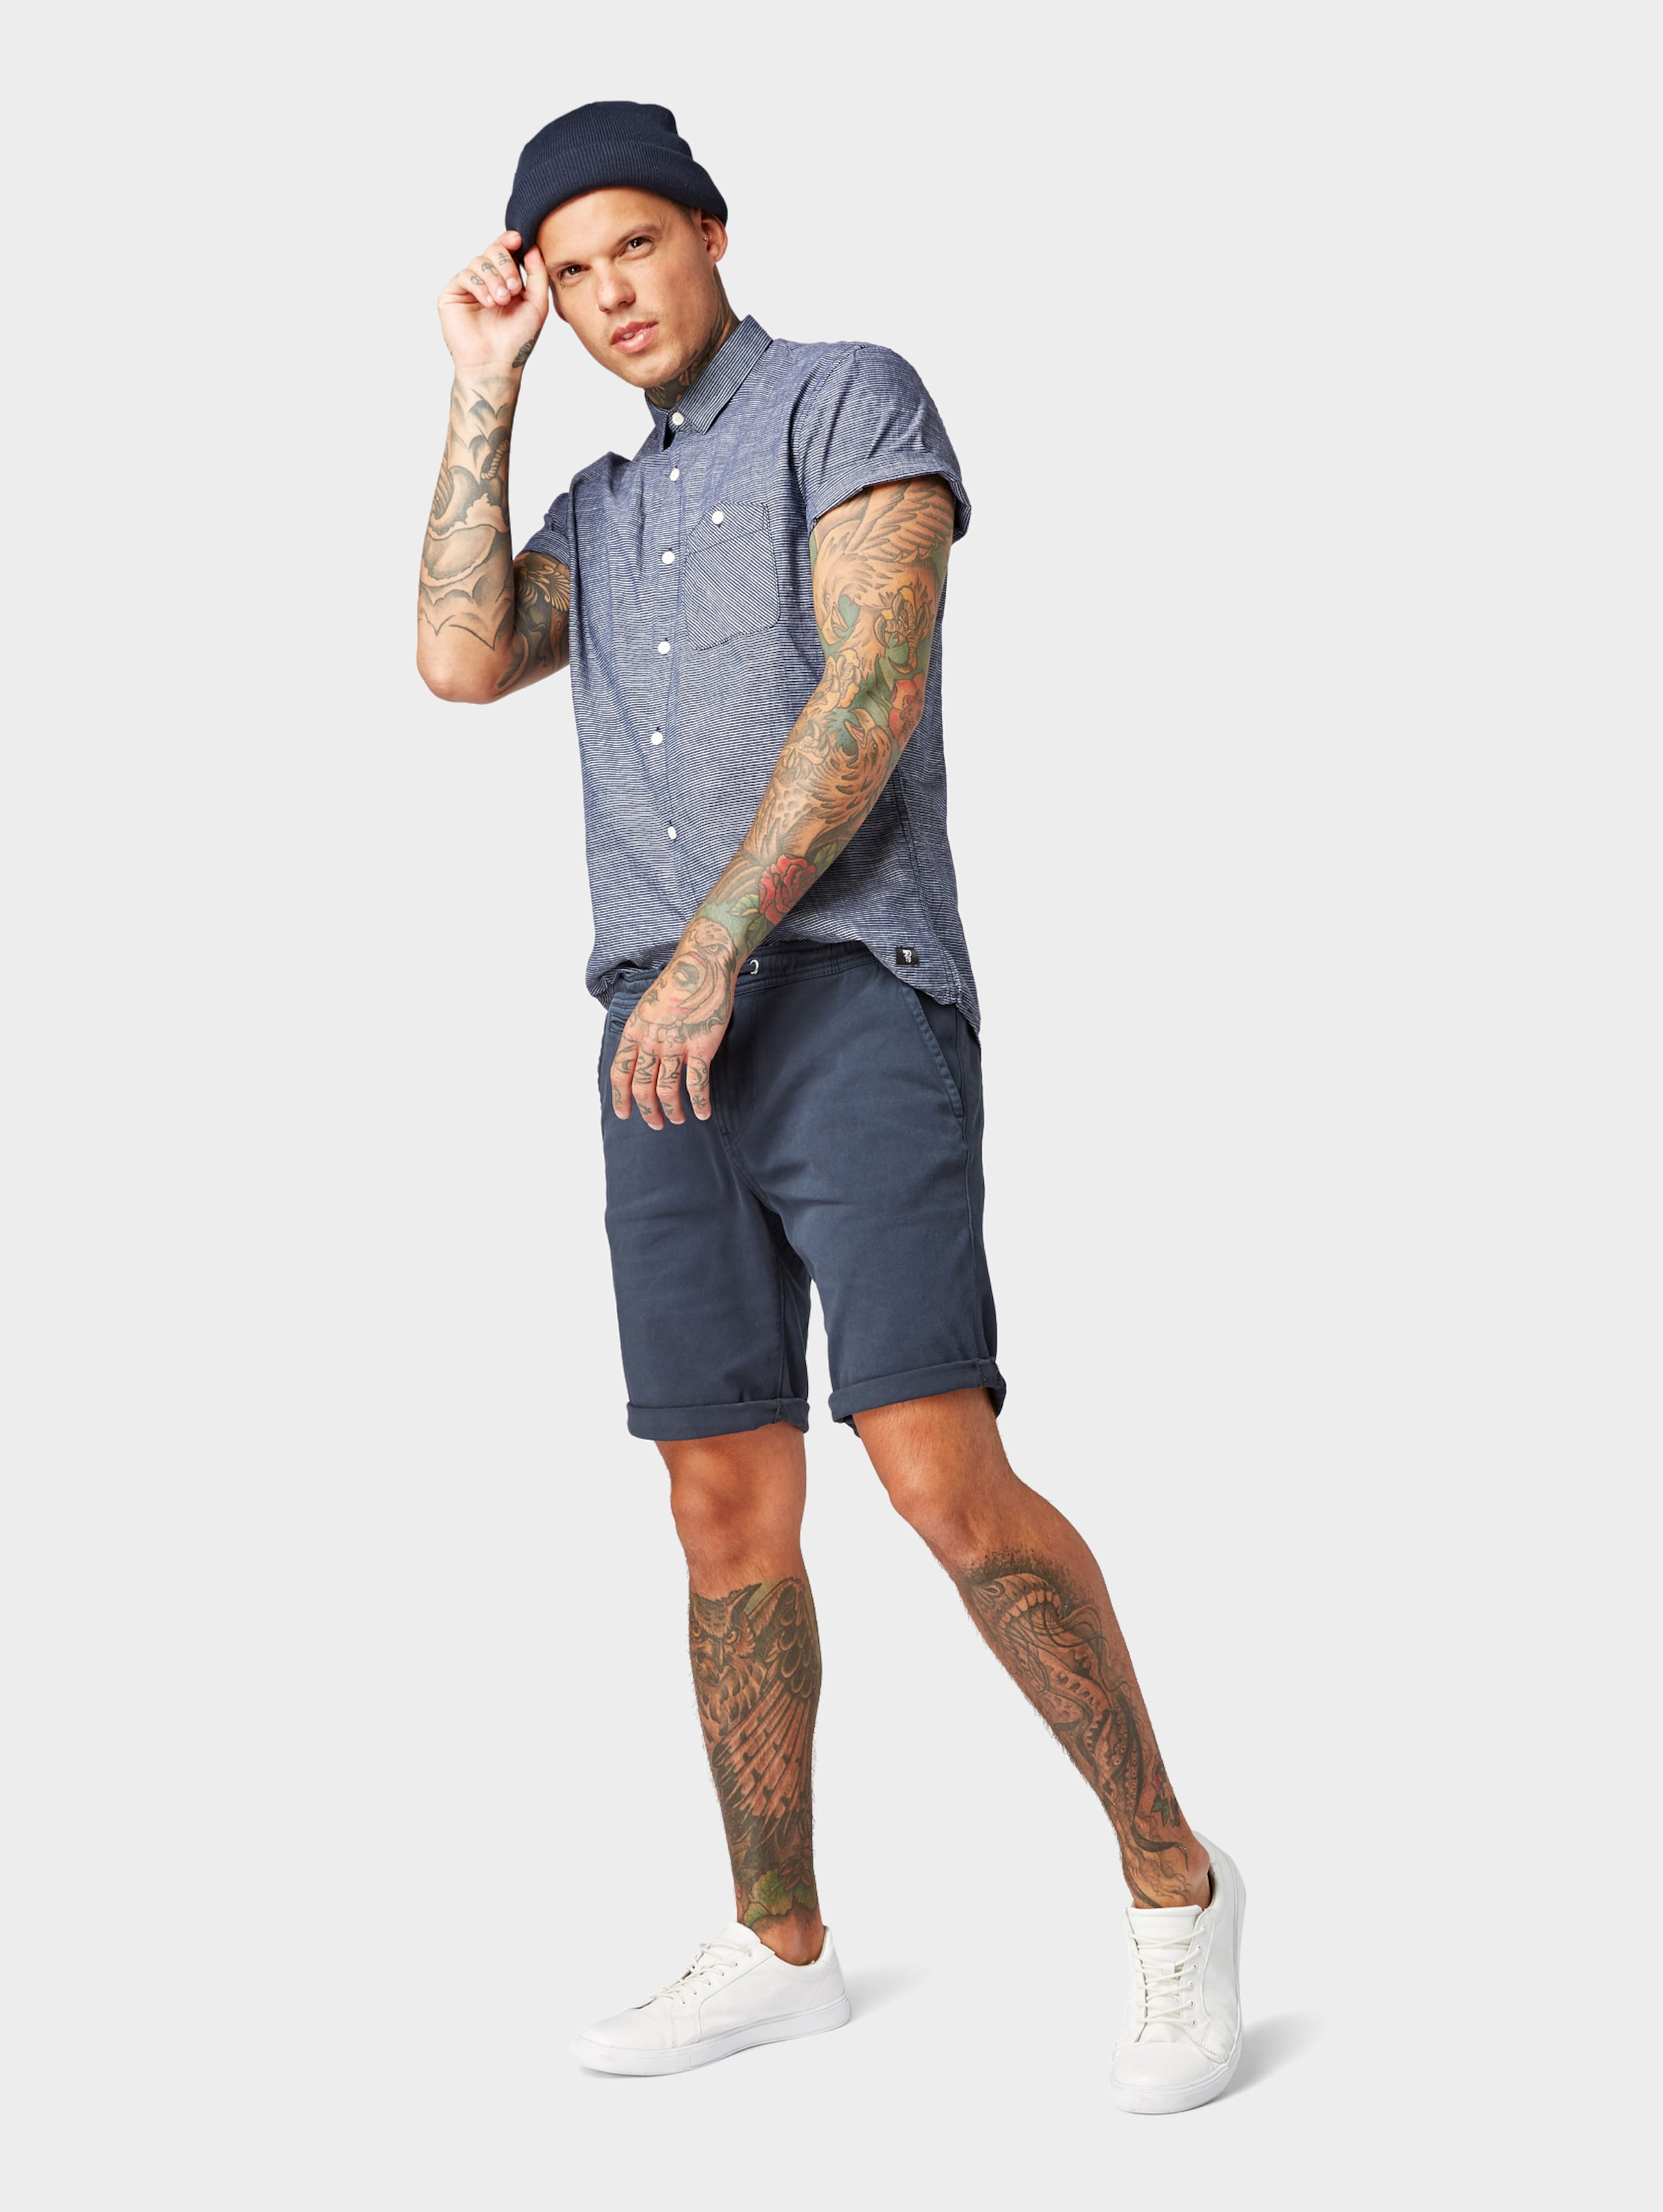 Tom Tailor In Kurzarmhemd Denim TaubenblauDunkelblau A3j4R5L